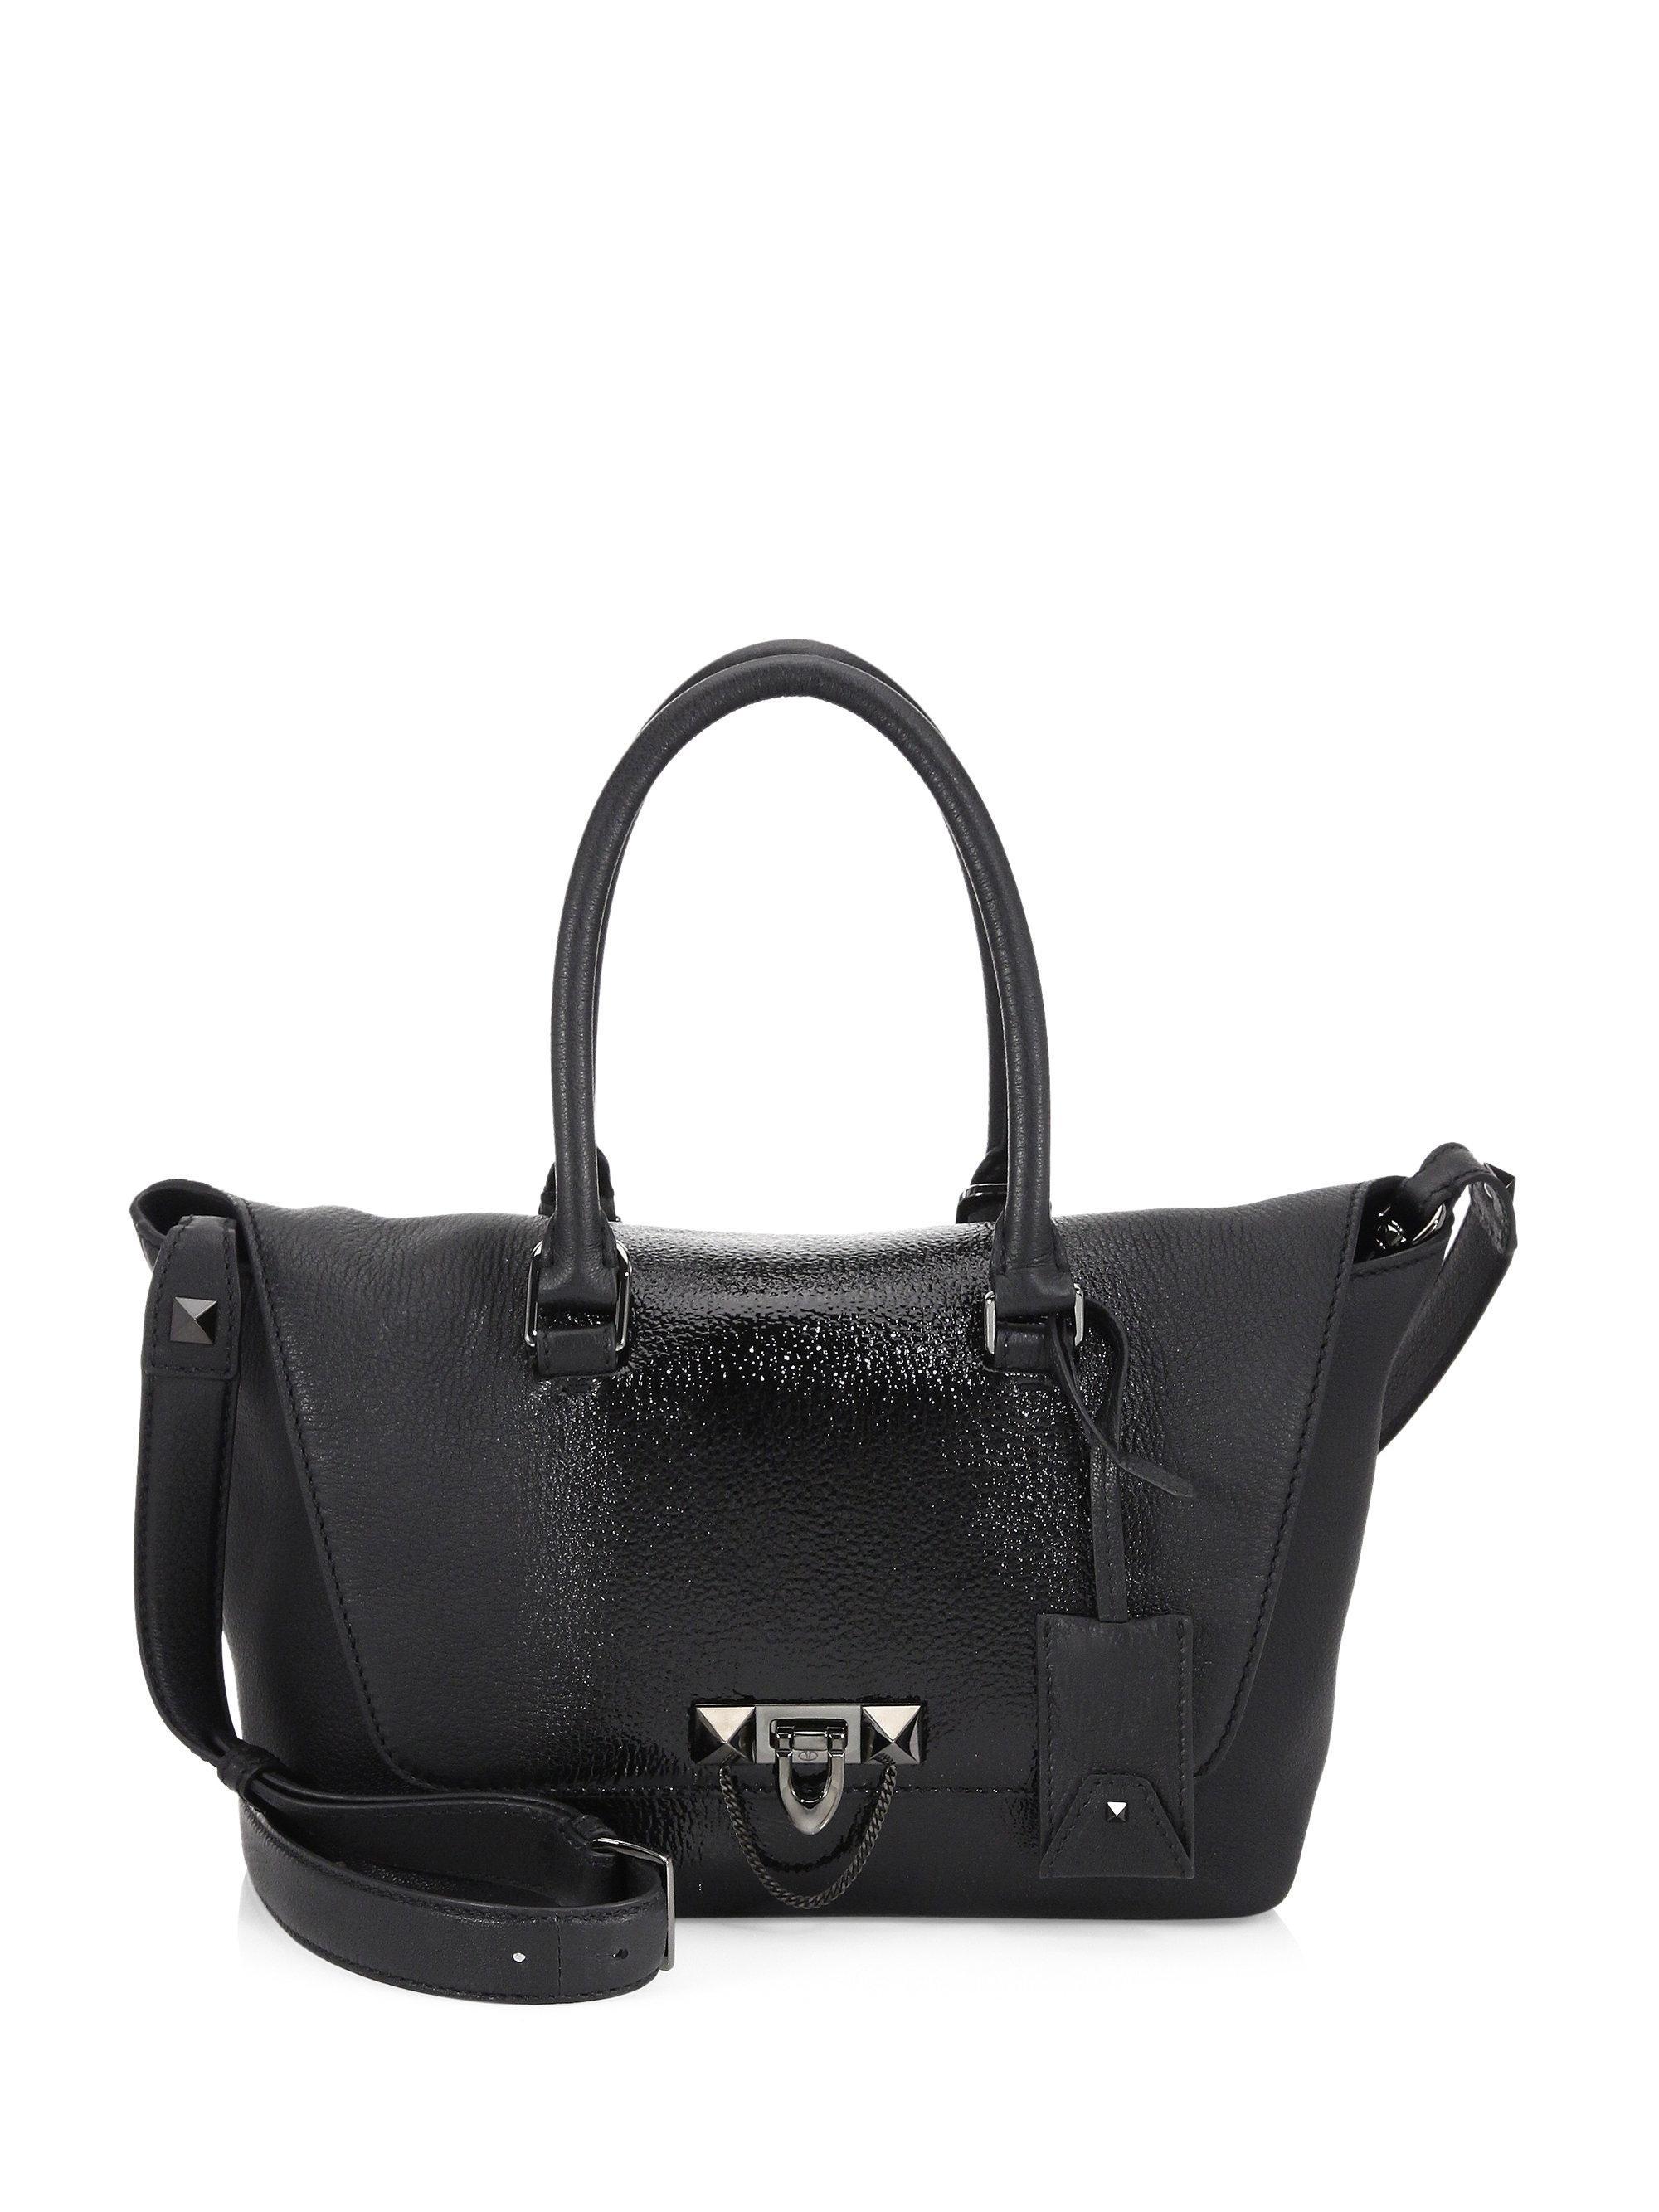 cab44cb9ccd Lyst - Valentino Demilune Leather Crossbody Bag in Black